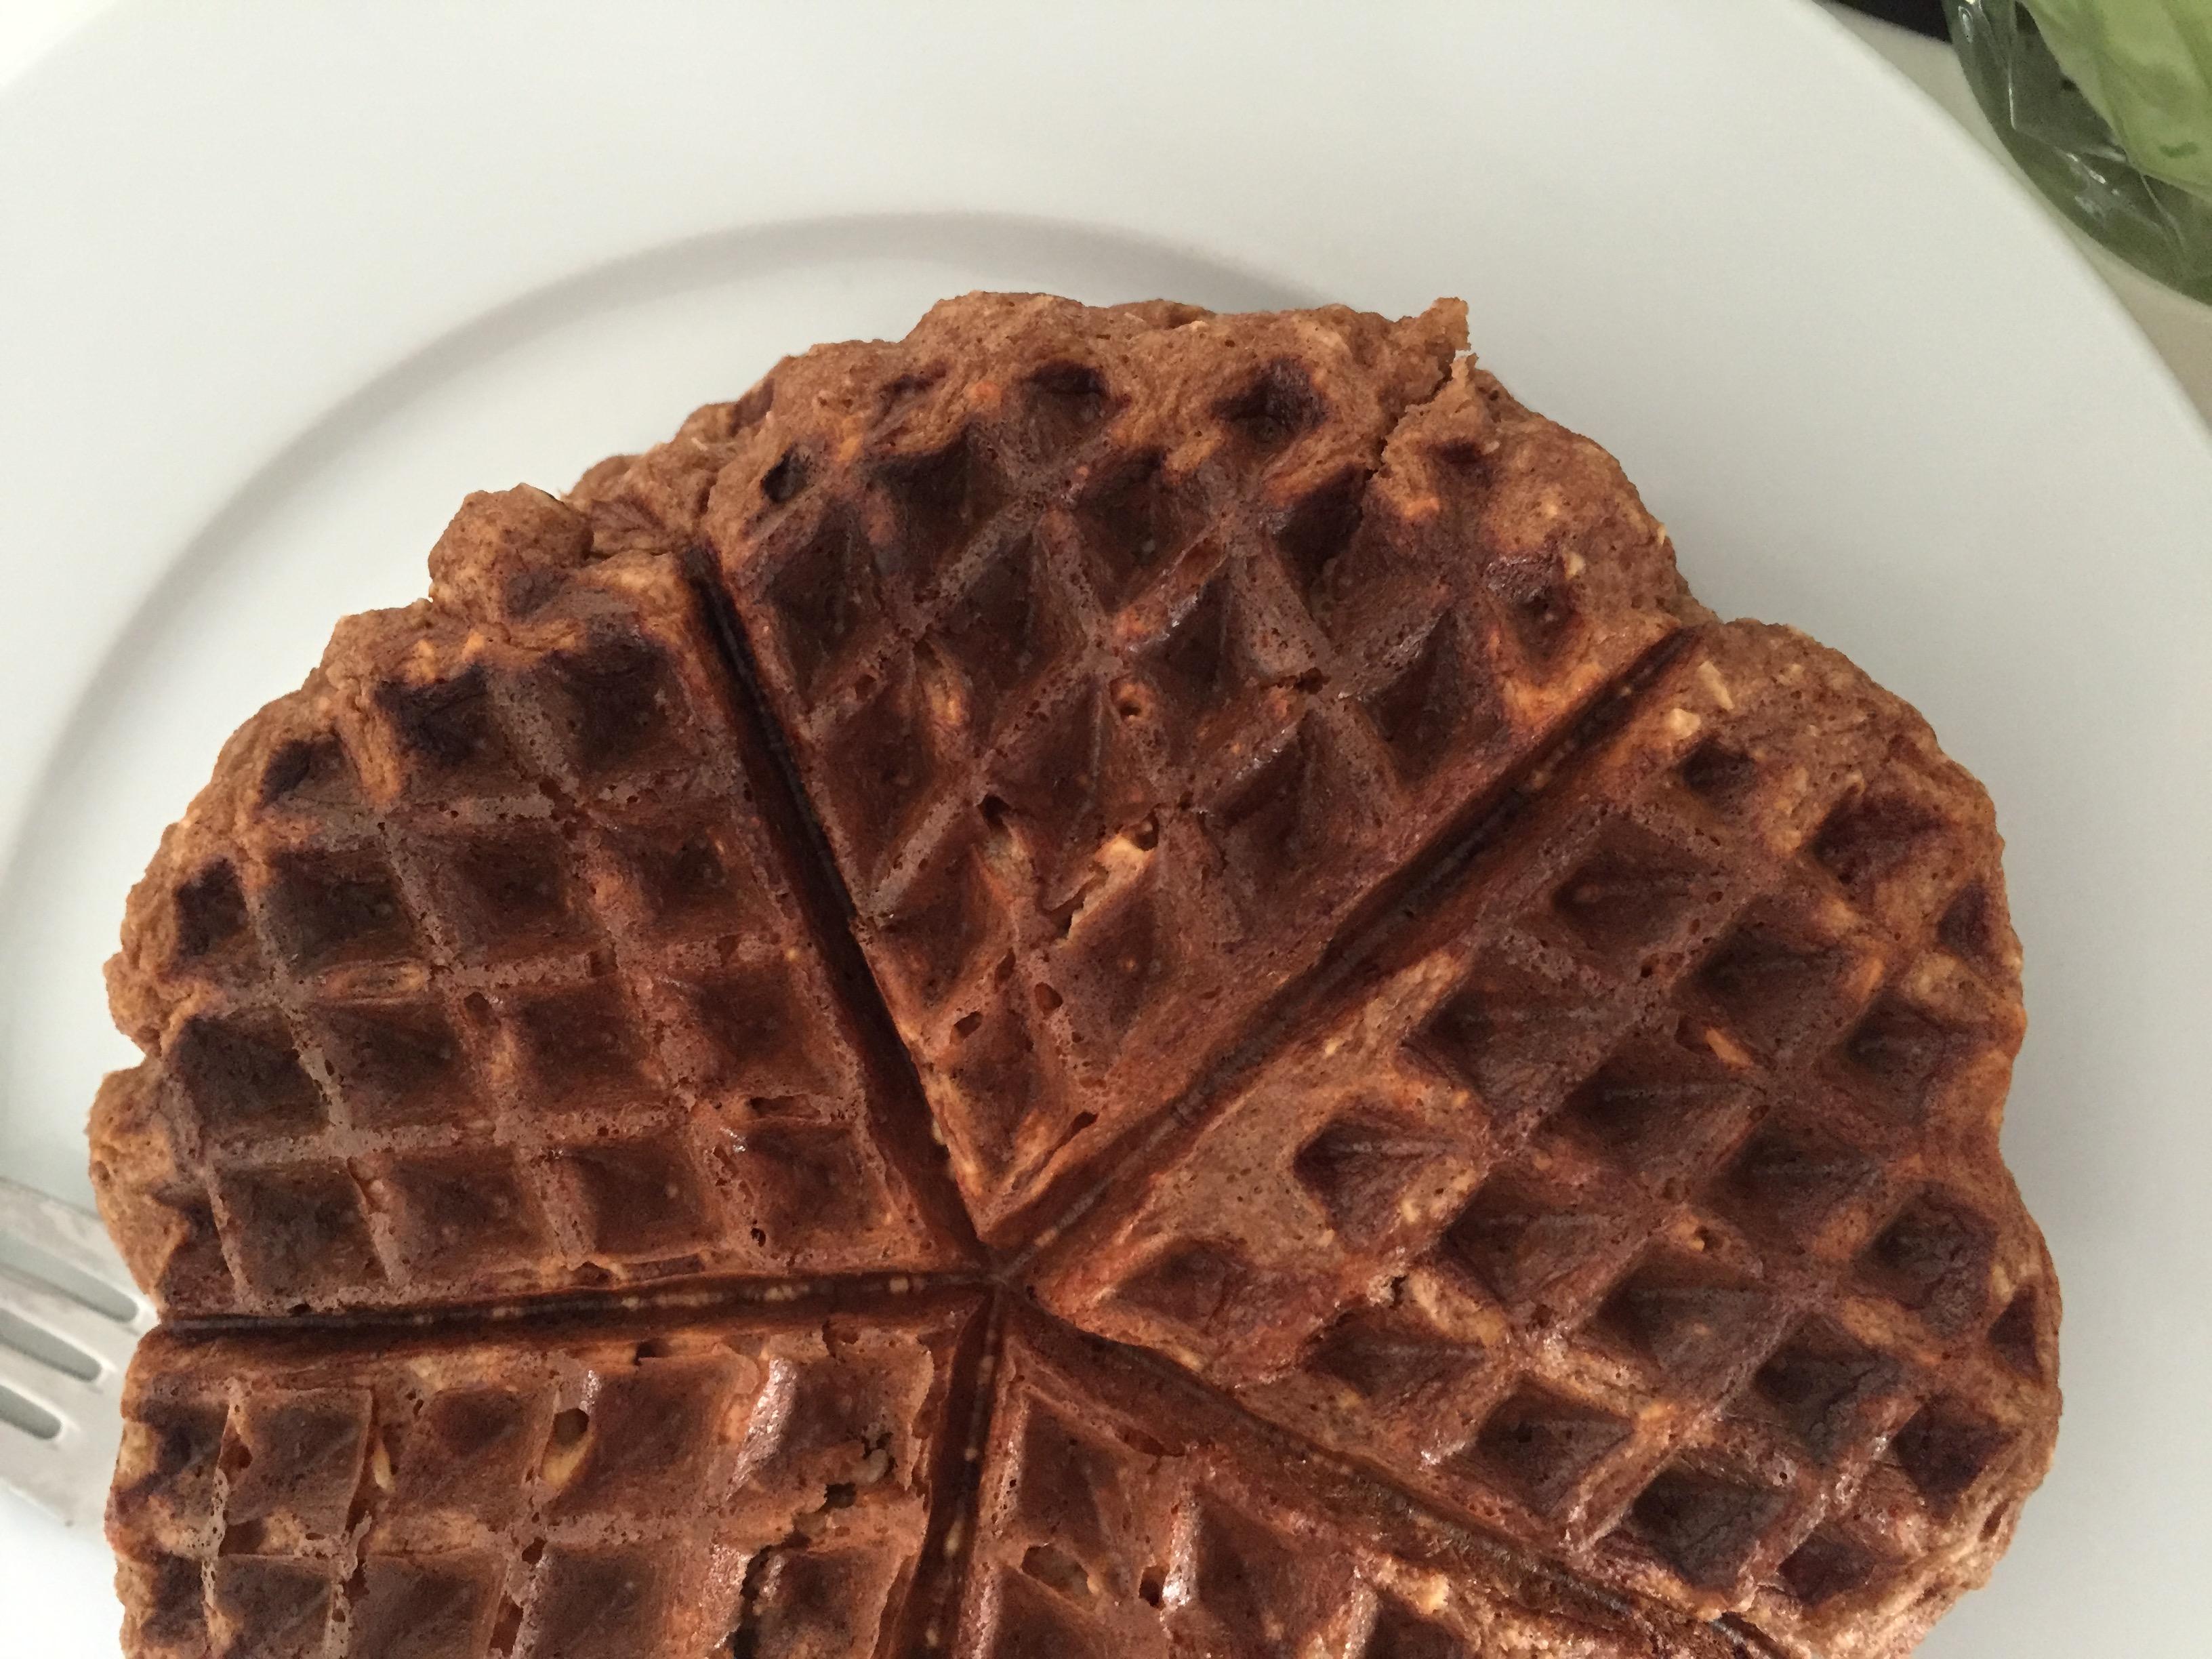 Chocolate Banana Brunch Waffles